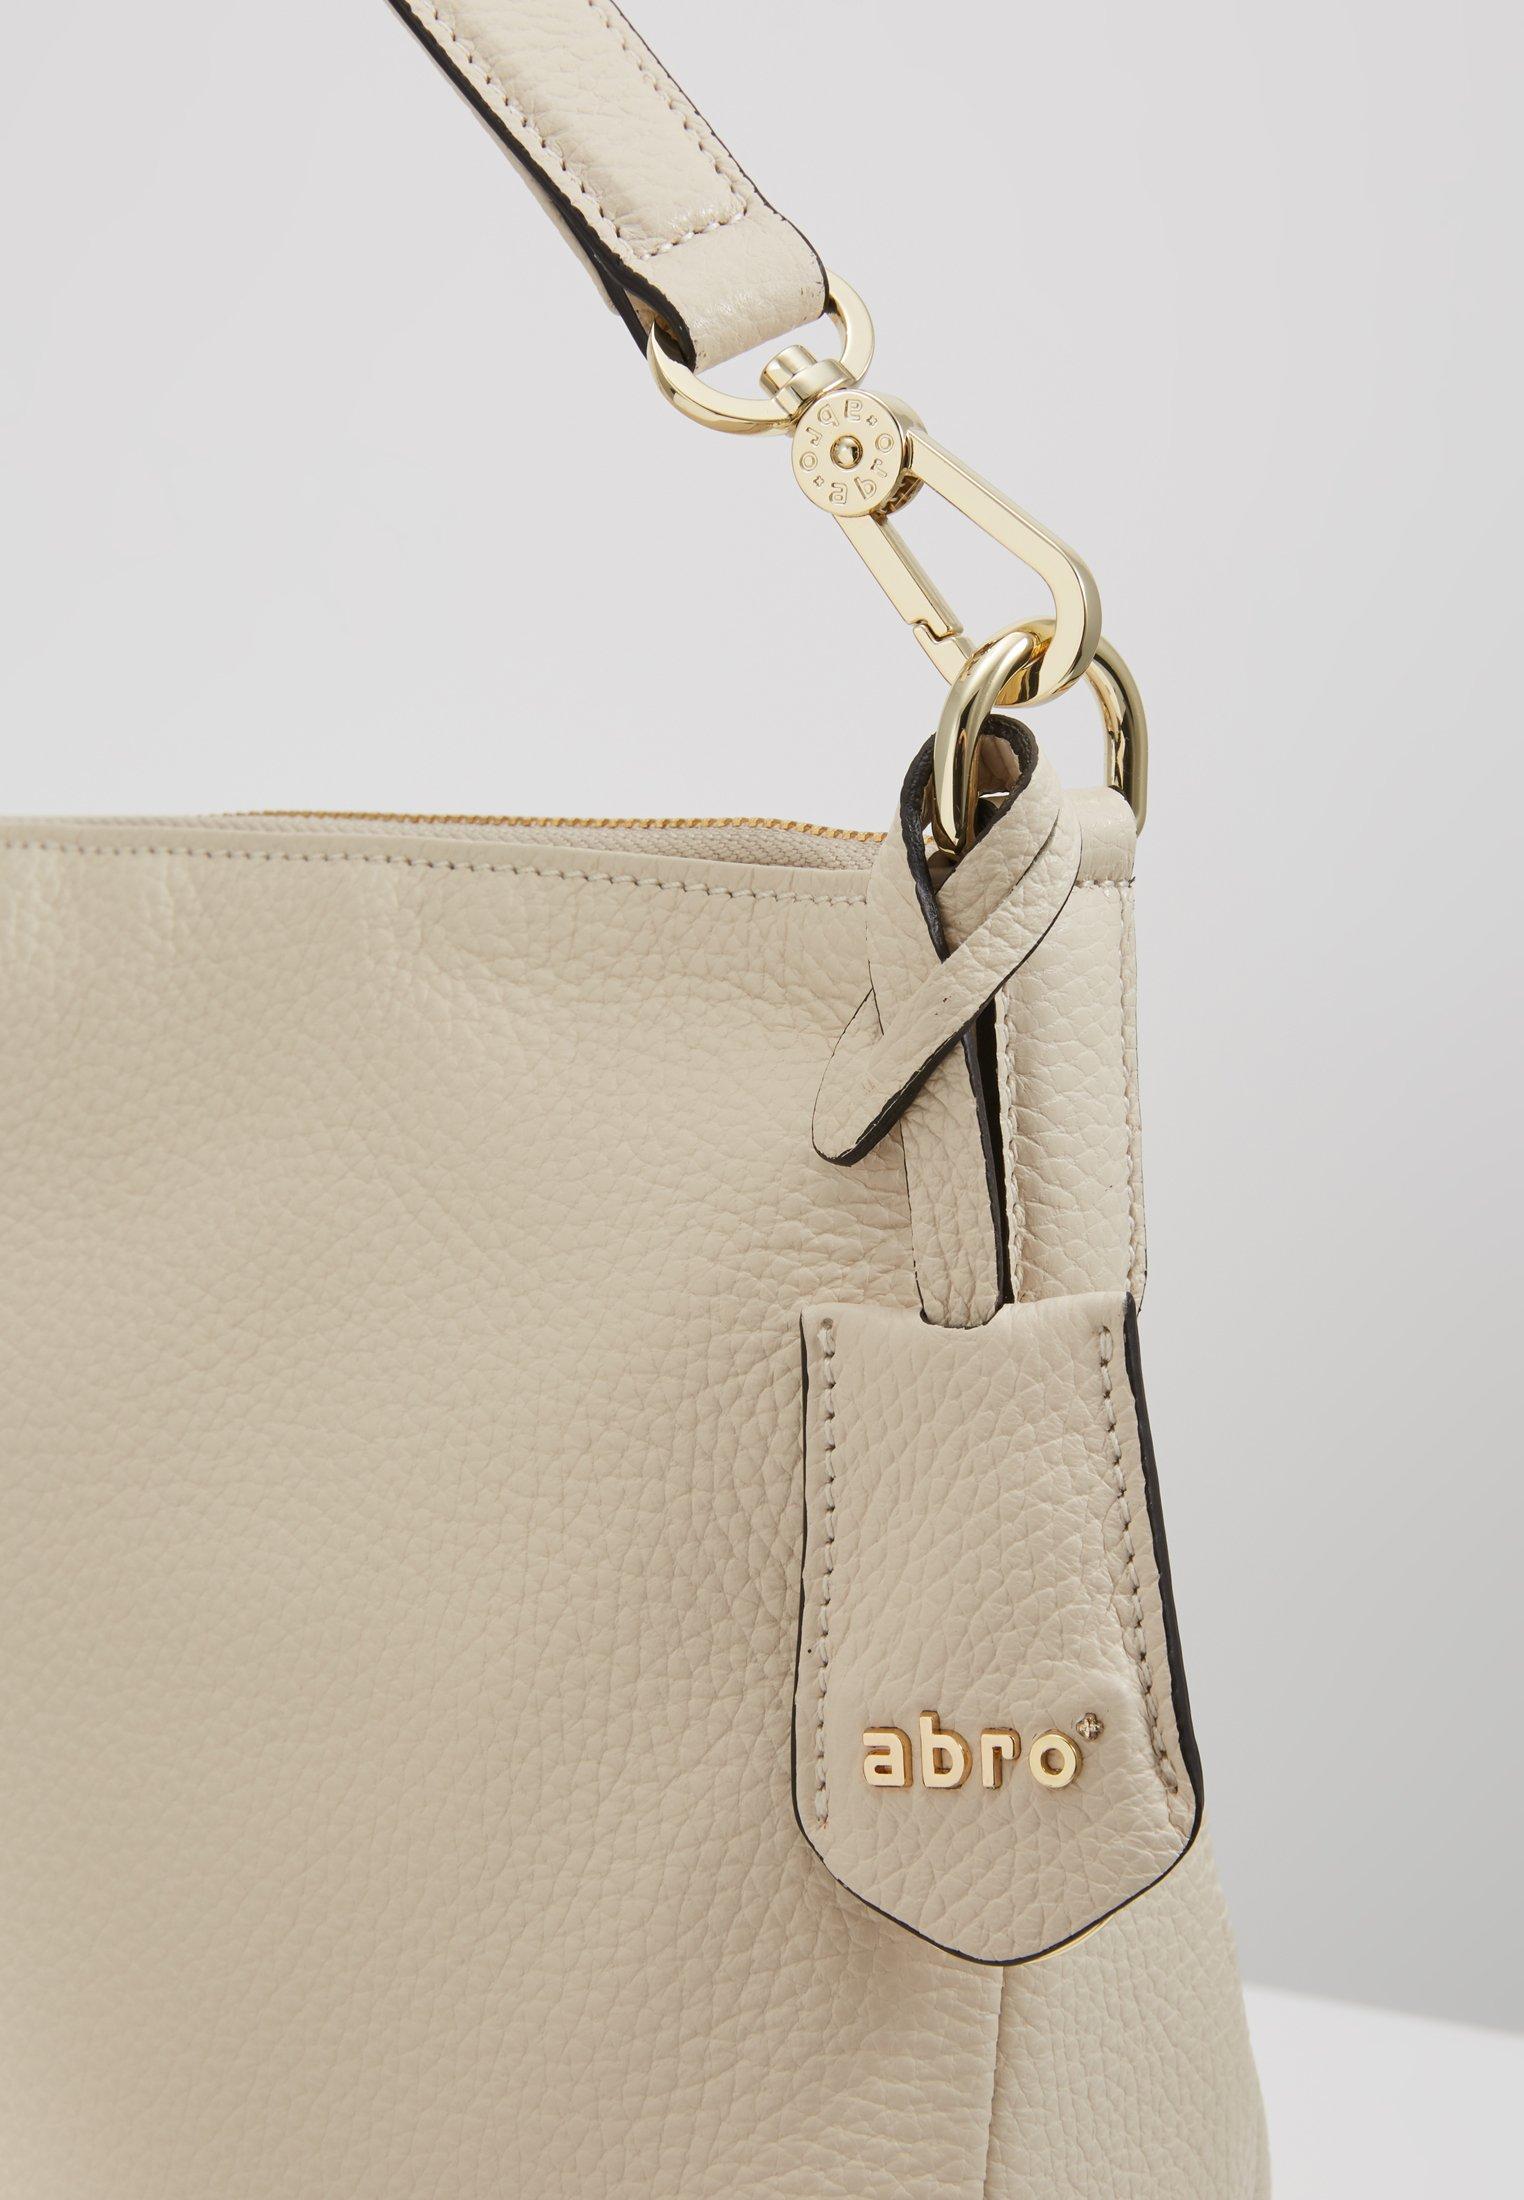 Abro Sac À Main - Ivory K0Ossx0